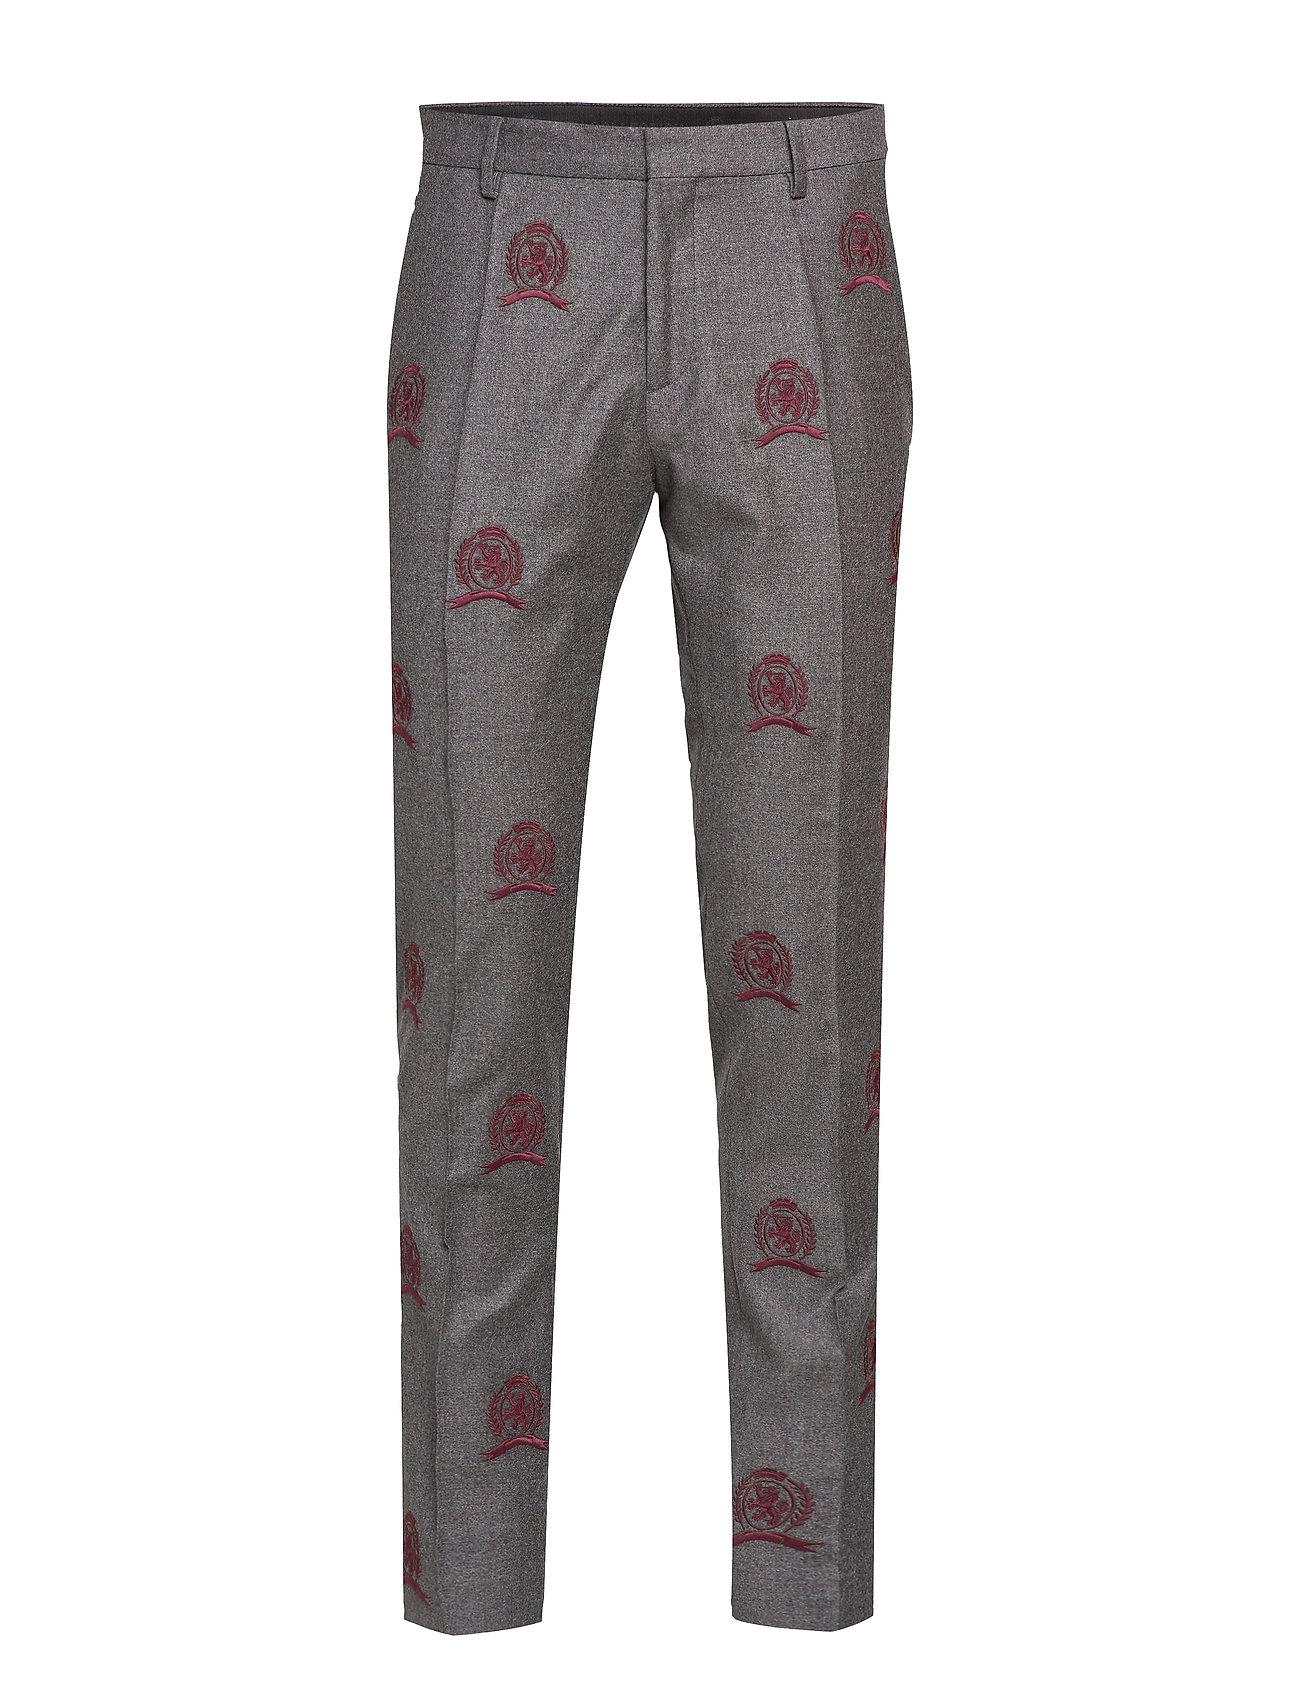 Image of Hcm Suit Sep Pants Embroidery Habitbukser Stylede Bukser Grå Hilfiger Collection (3406228327)